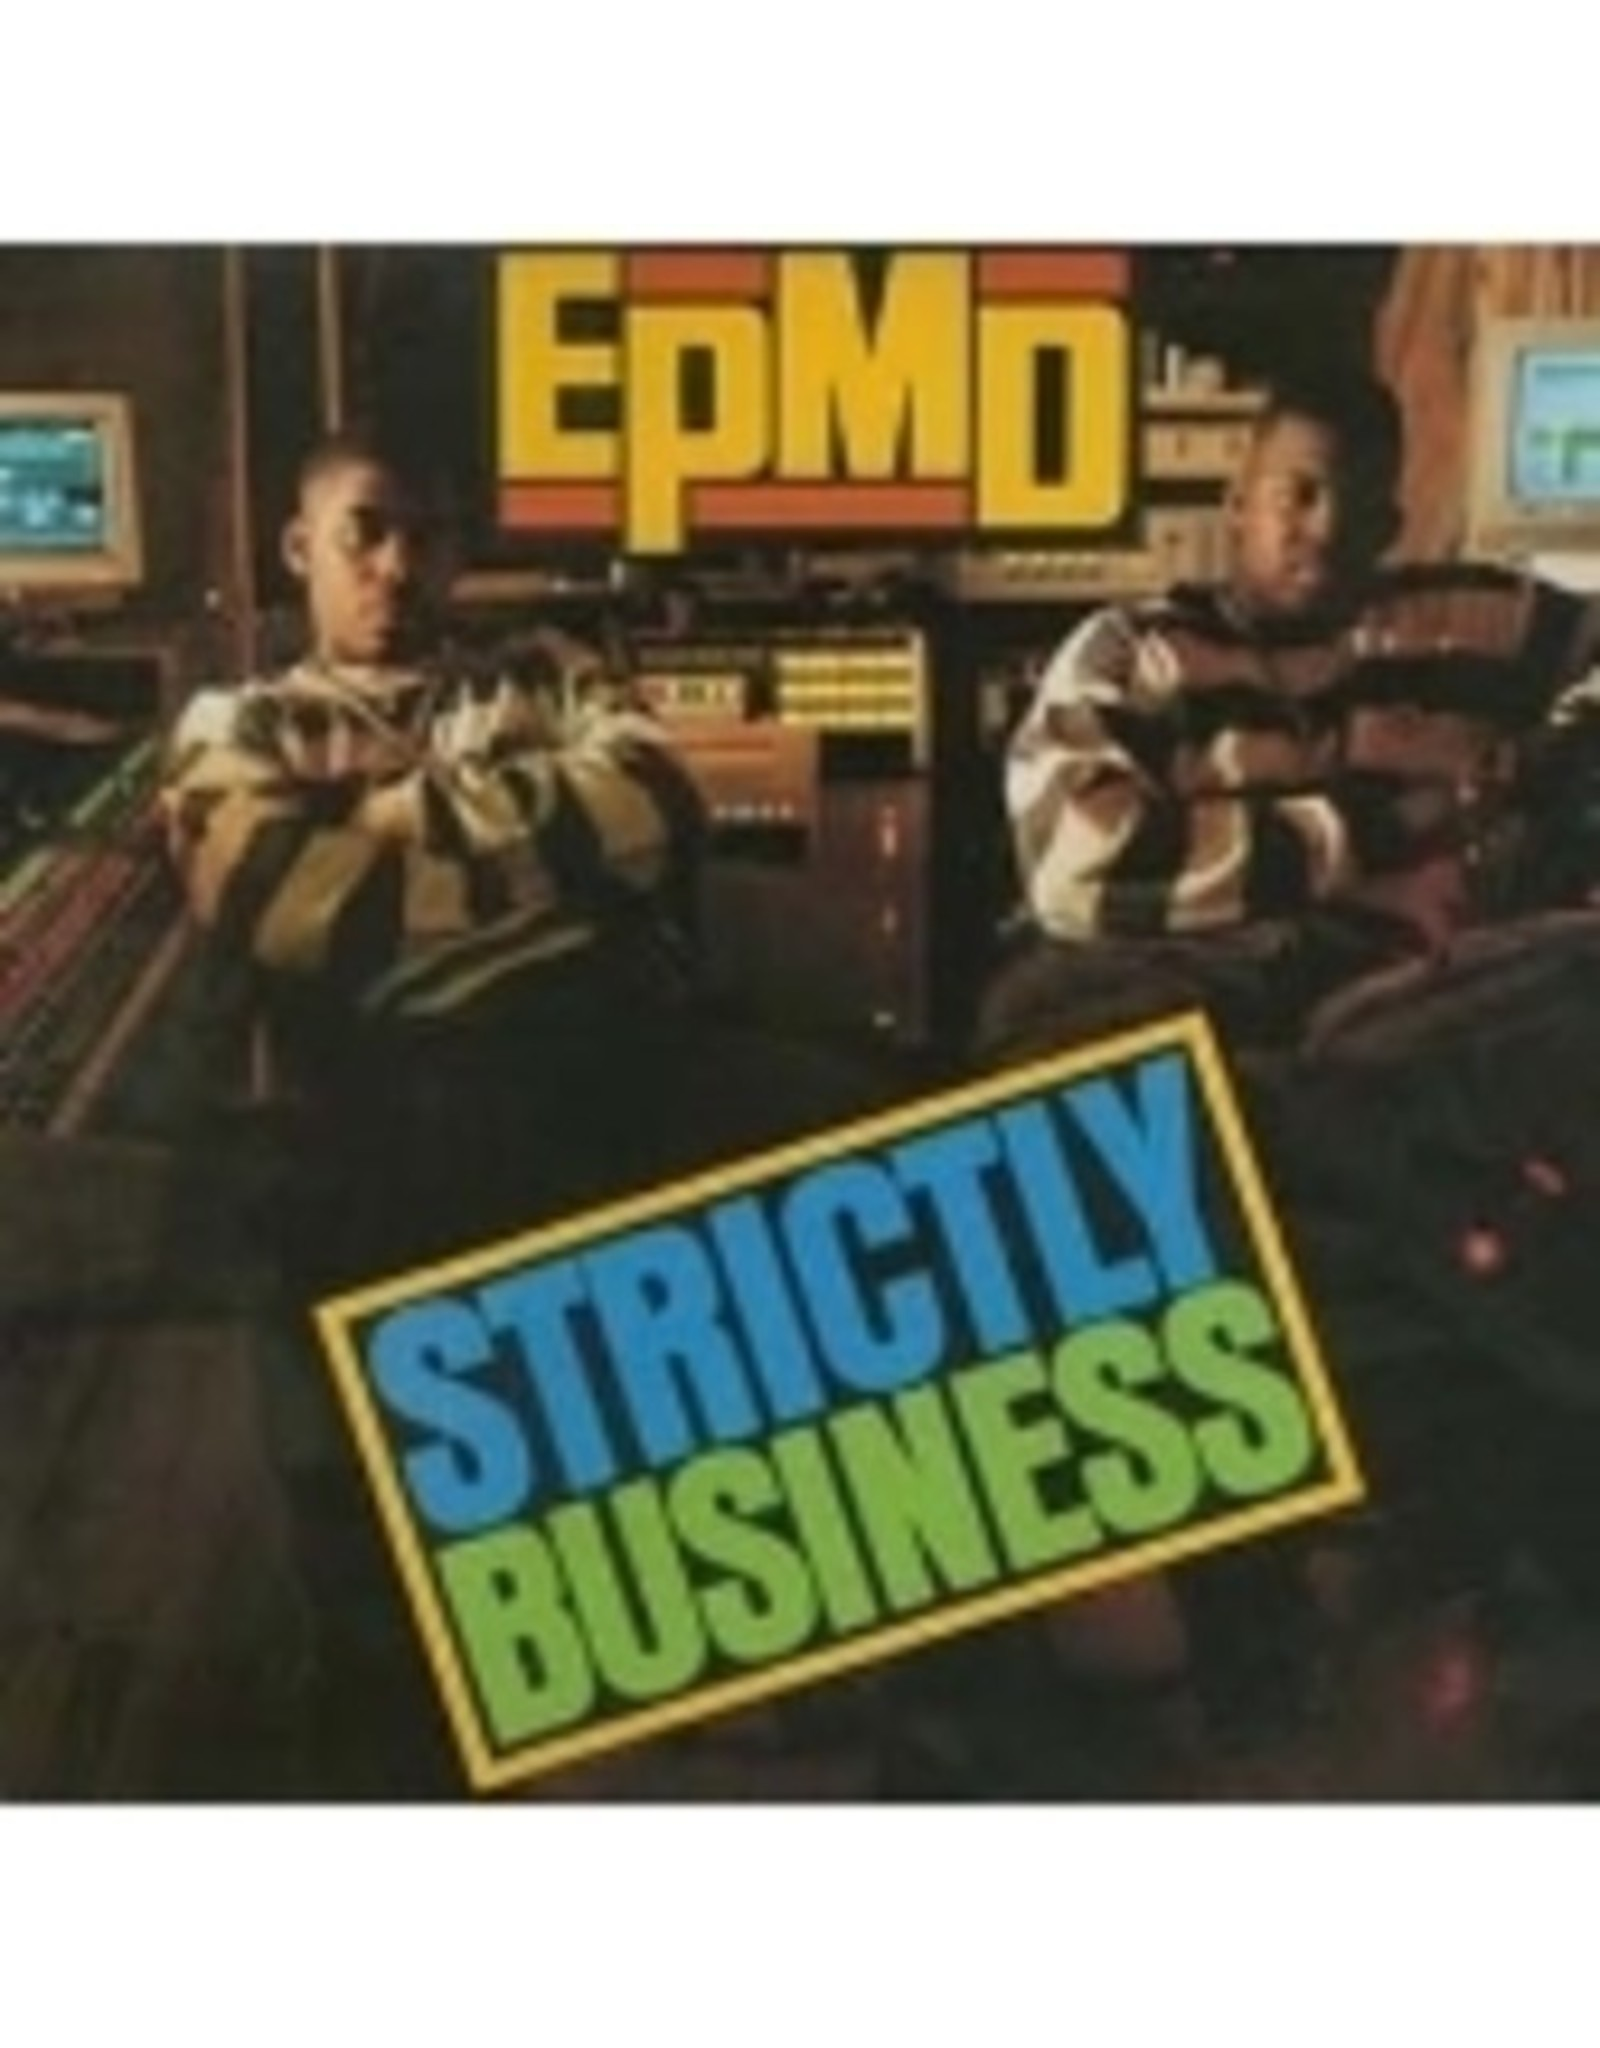 New Vinyl EPMD - Strictly Business 2LP